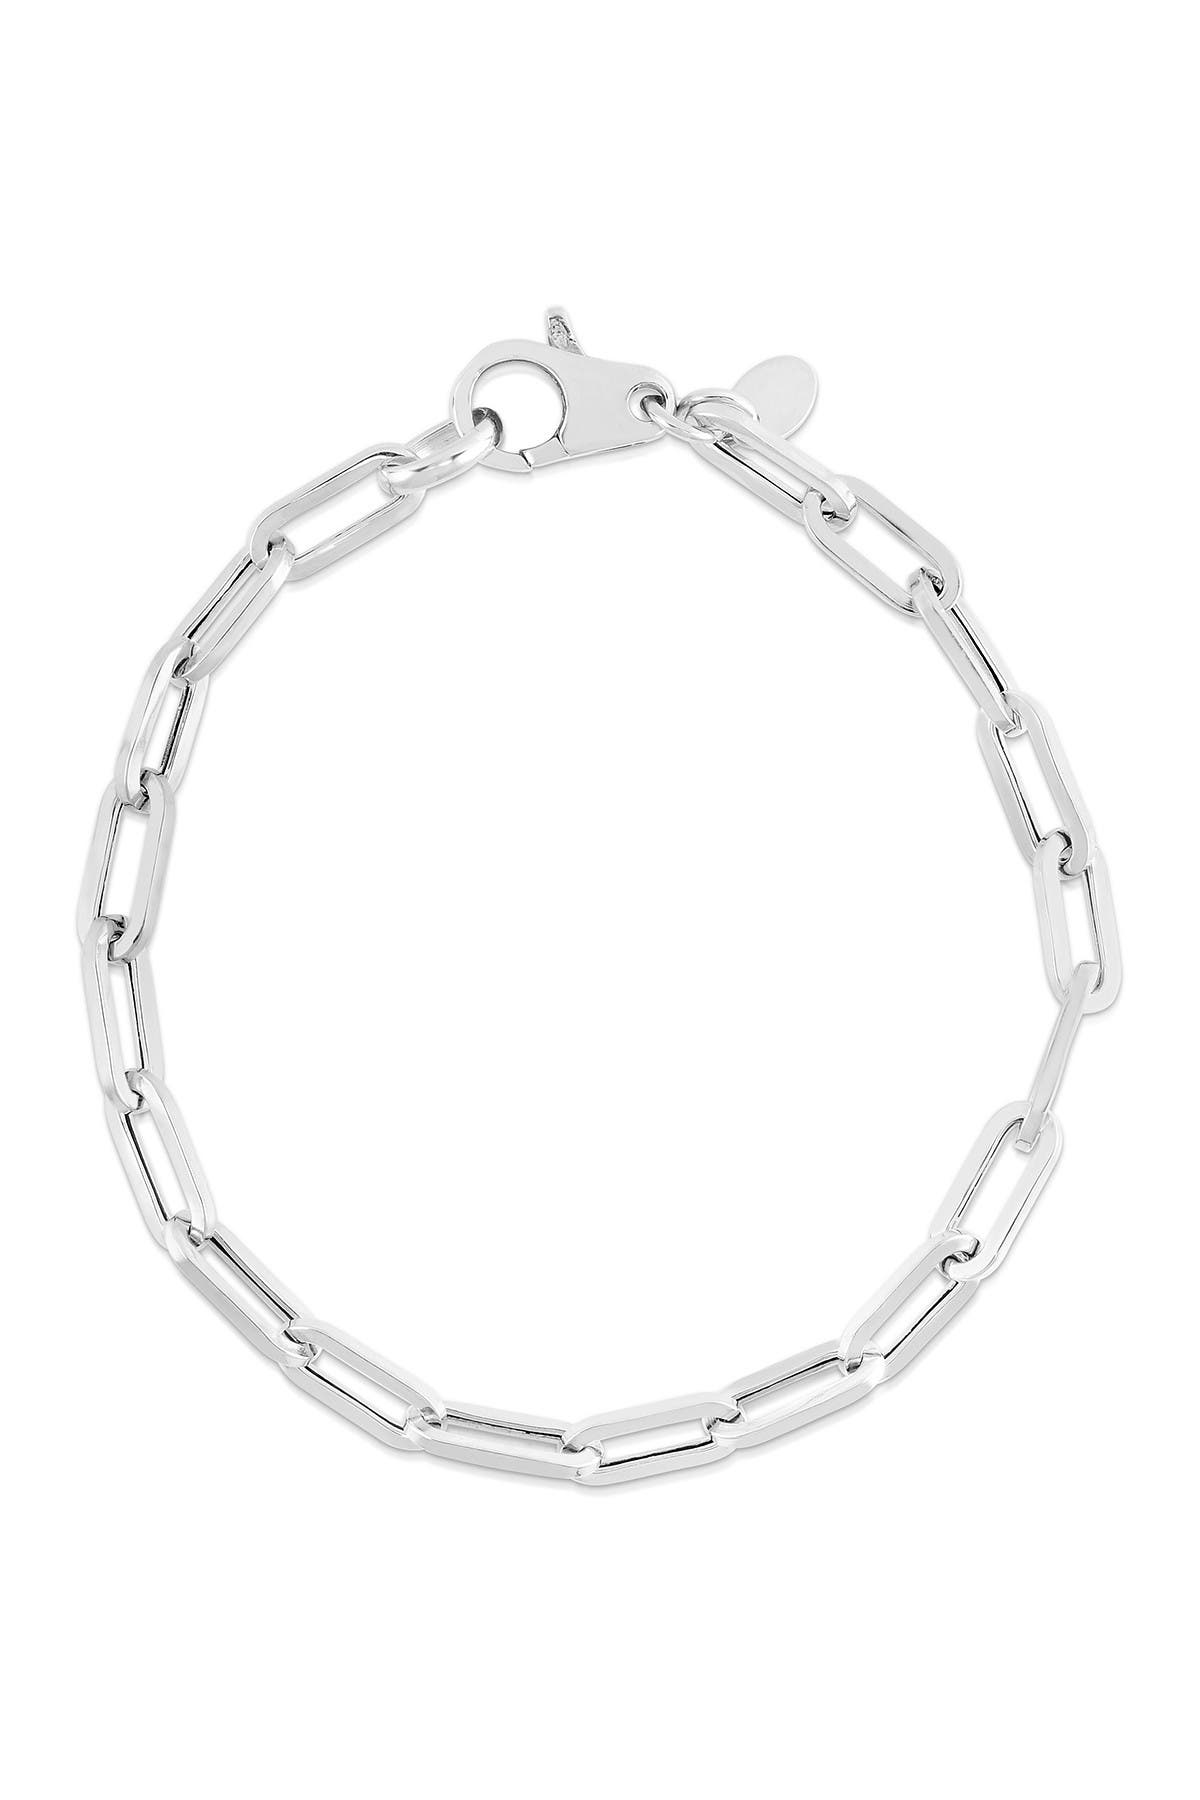 Image of Sphera Milano Rhodium Plated Sterling Silver Link Bracelet